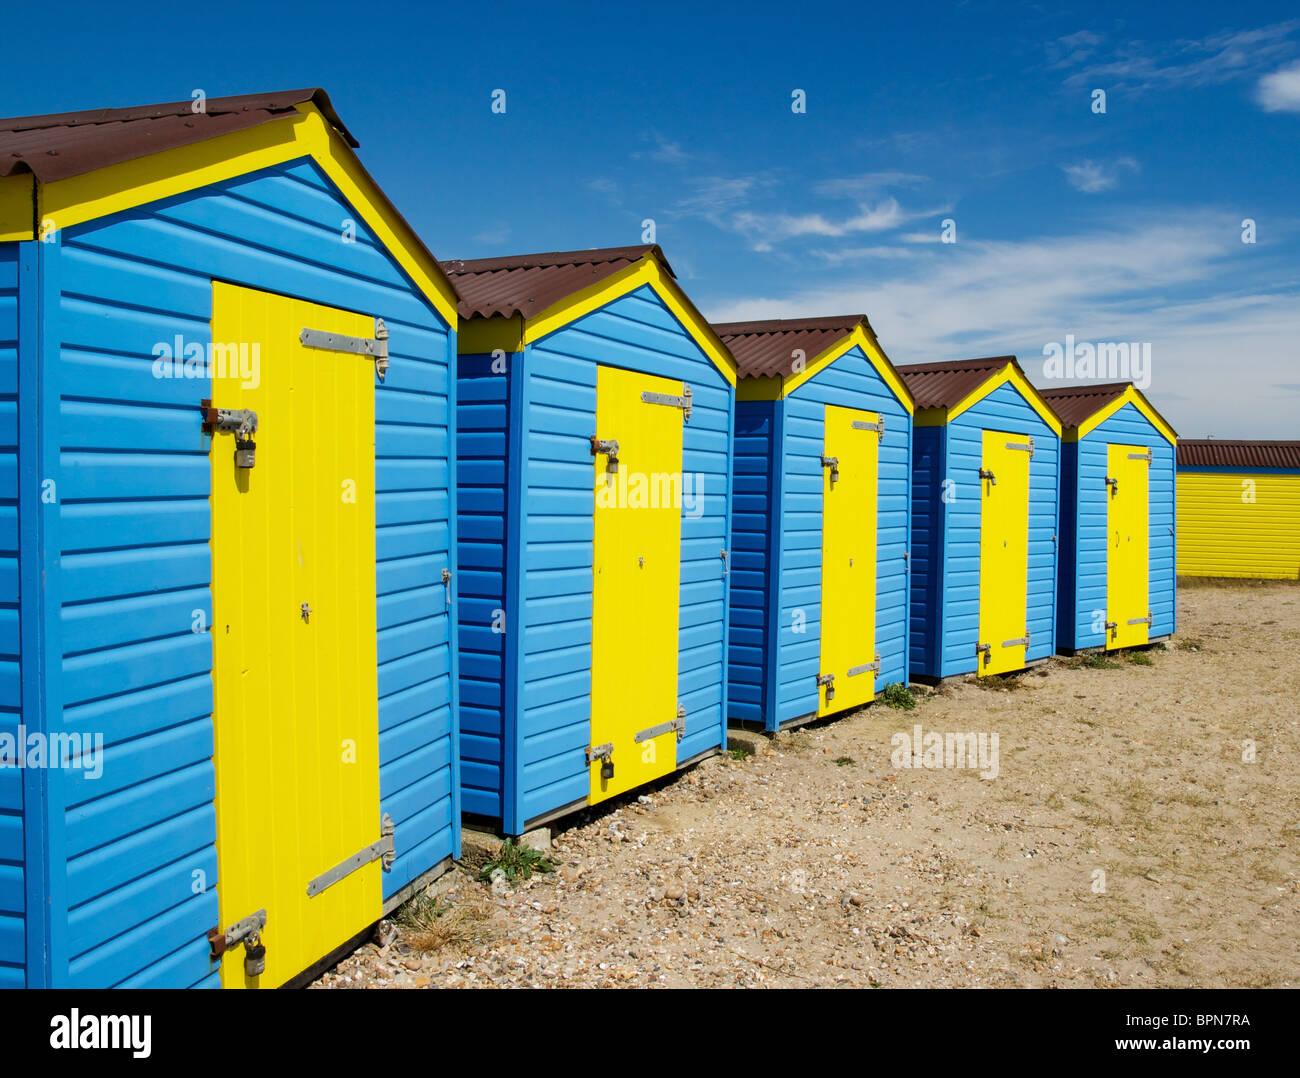 Beach Huts on England's South Coast - Stock Image